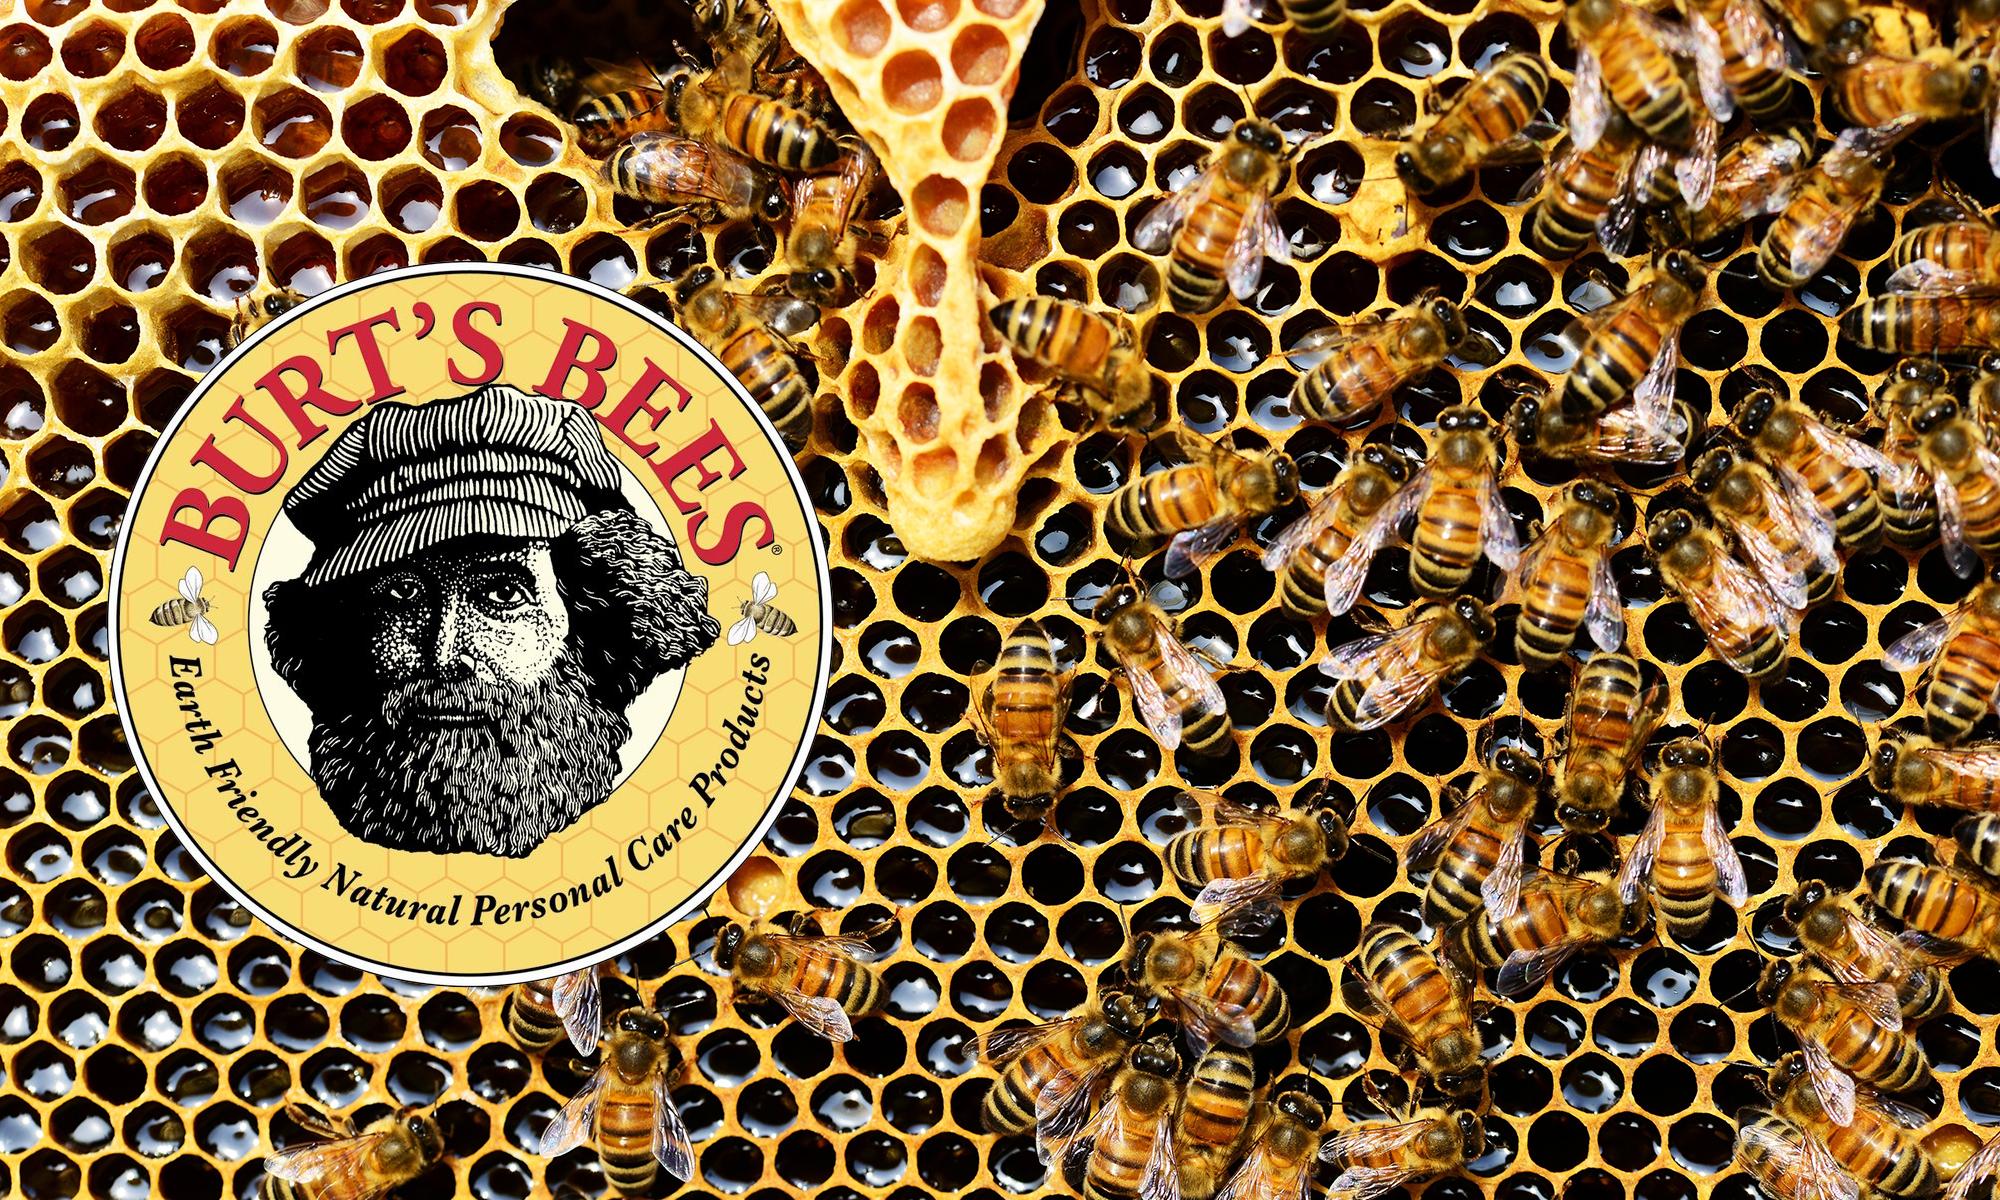 Burt's Bees original logo and bee photo